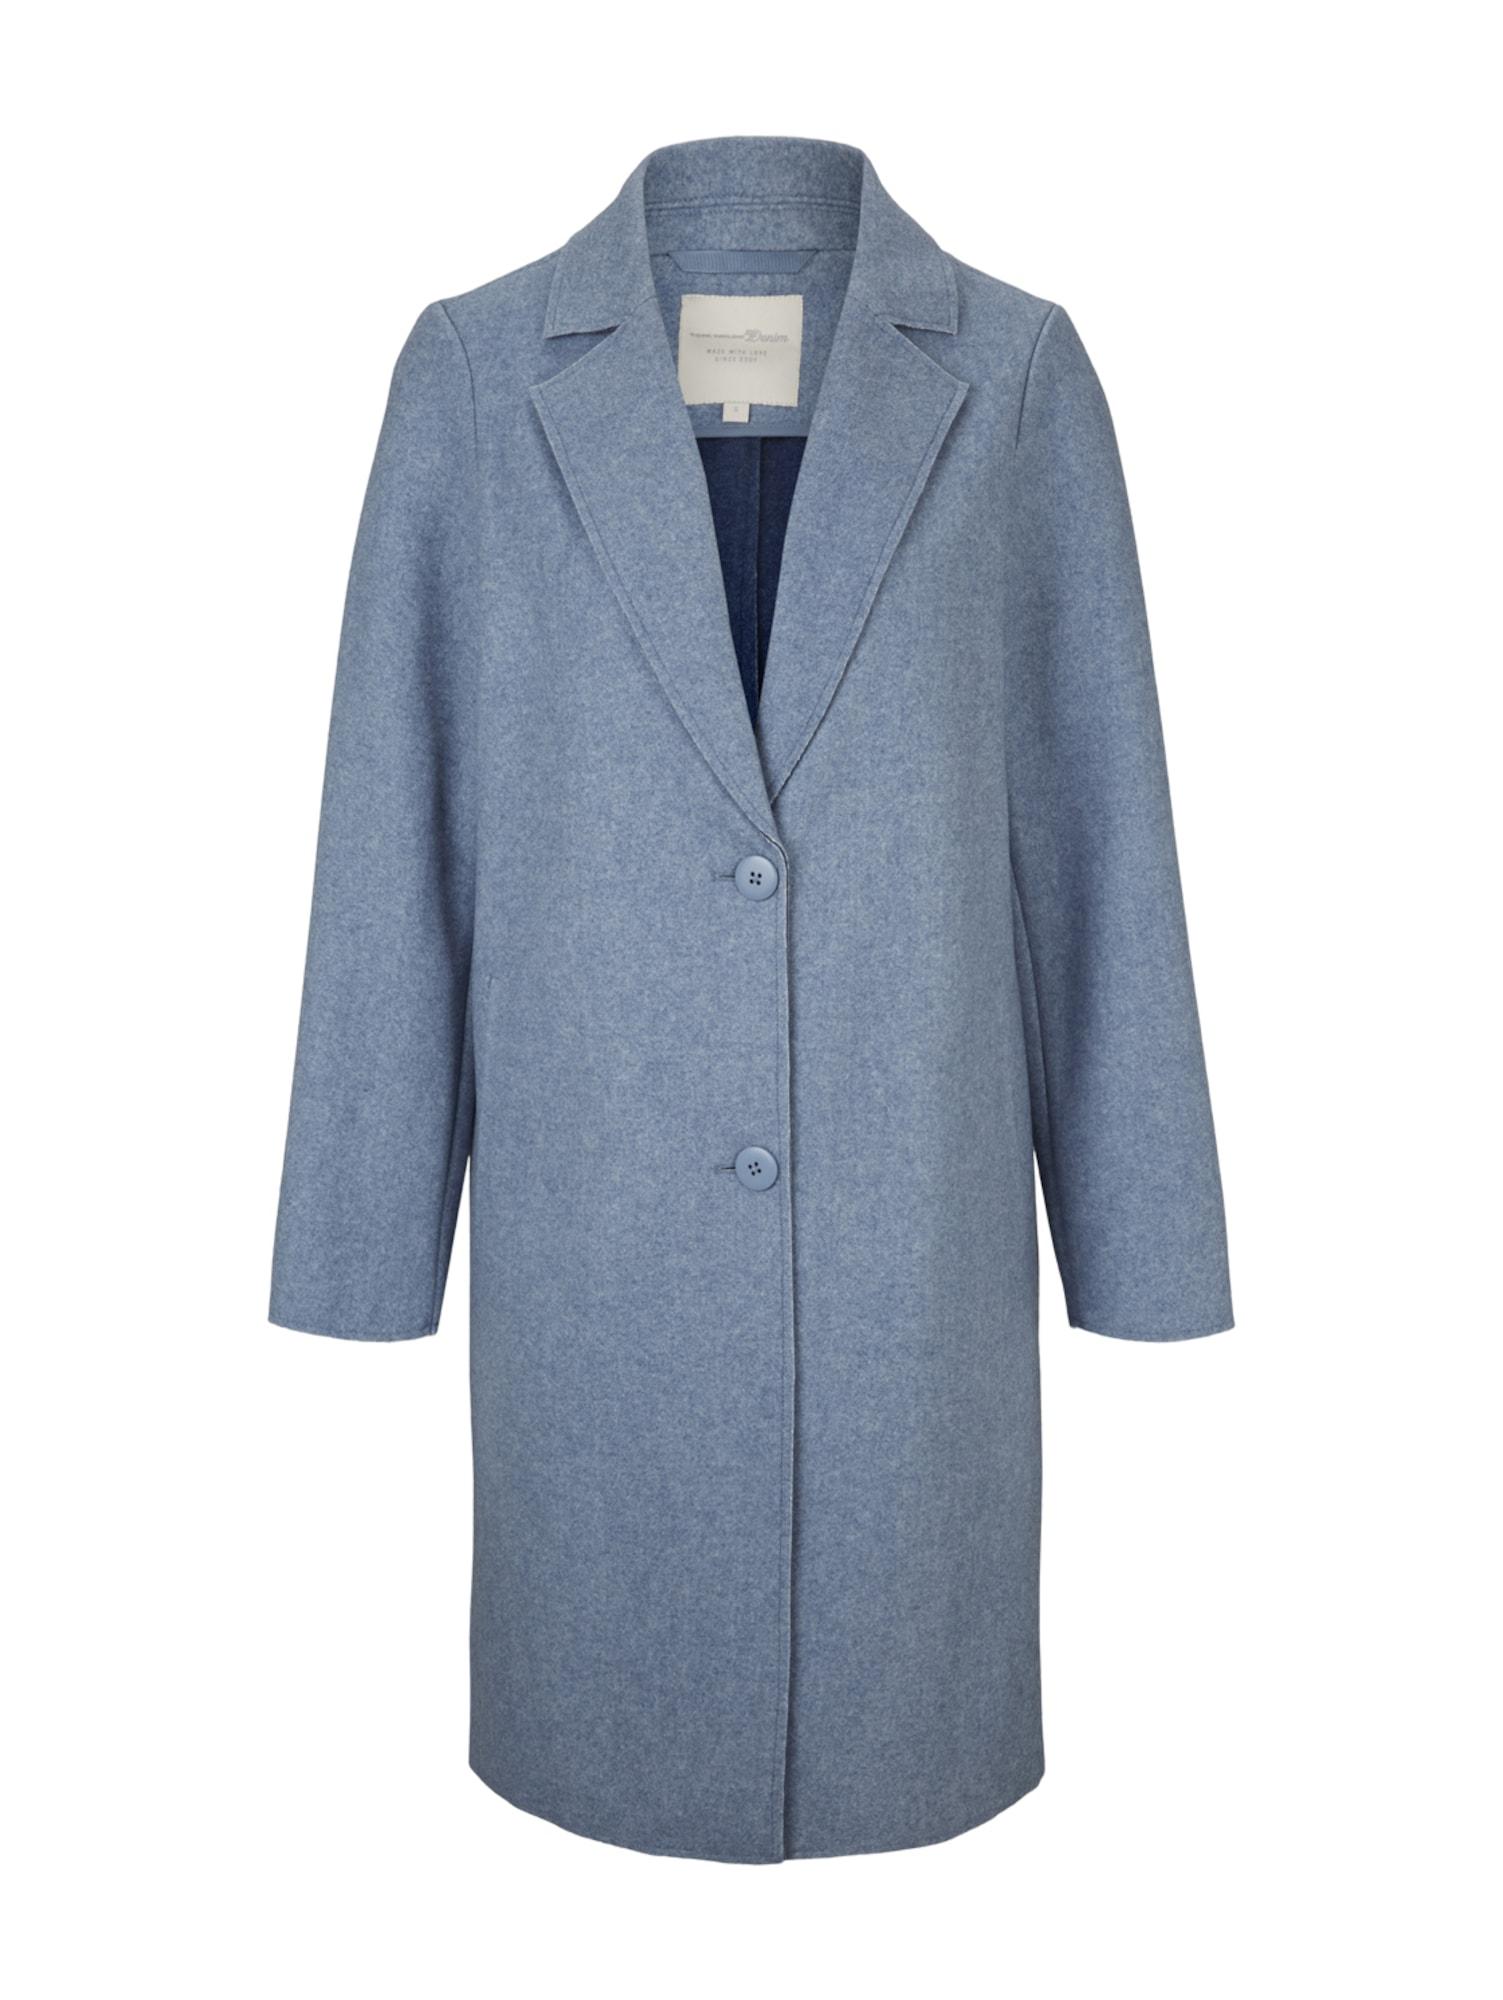 TOM TAILOR DENIM Demisezoninis paltas mėlyna dūmų spalva